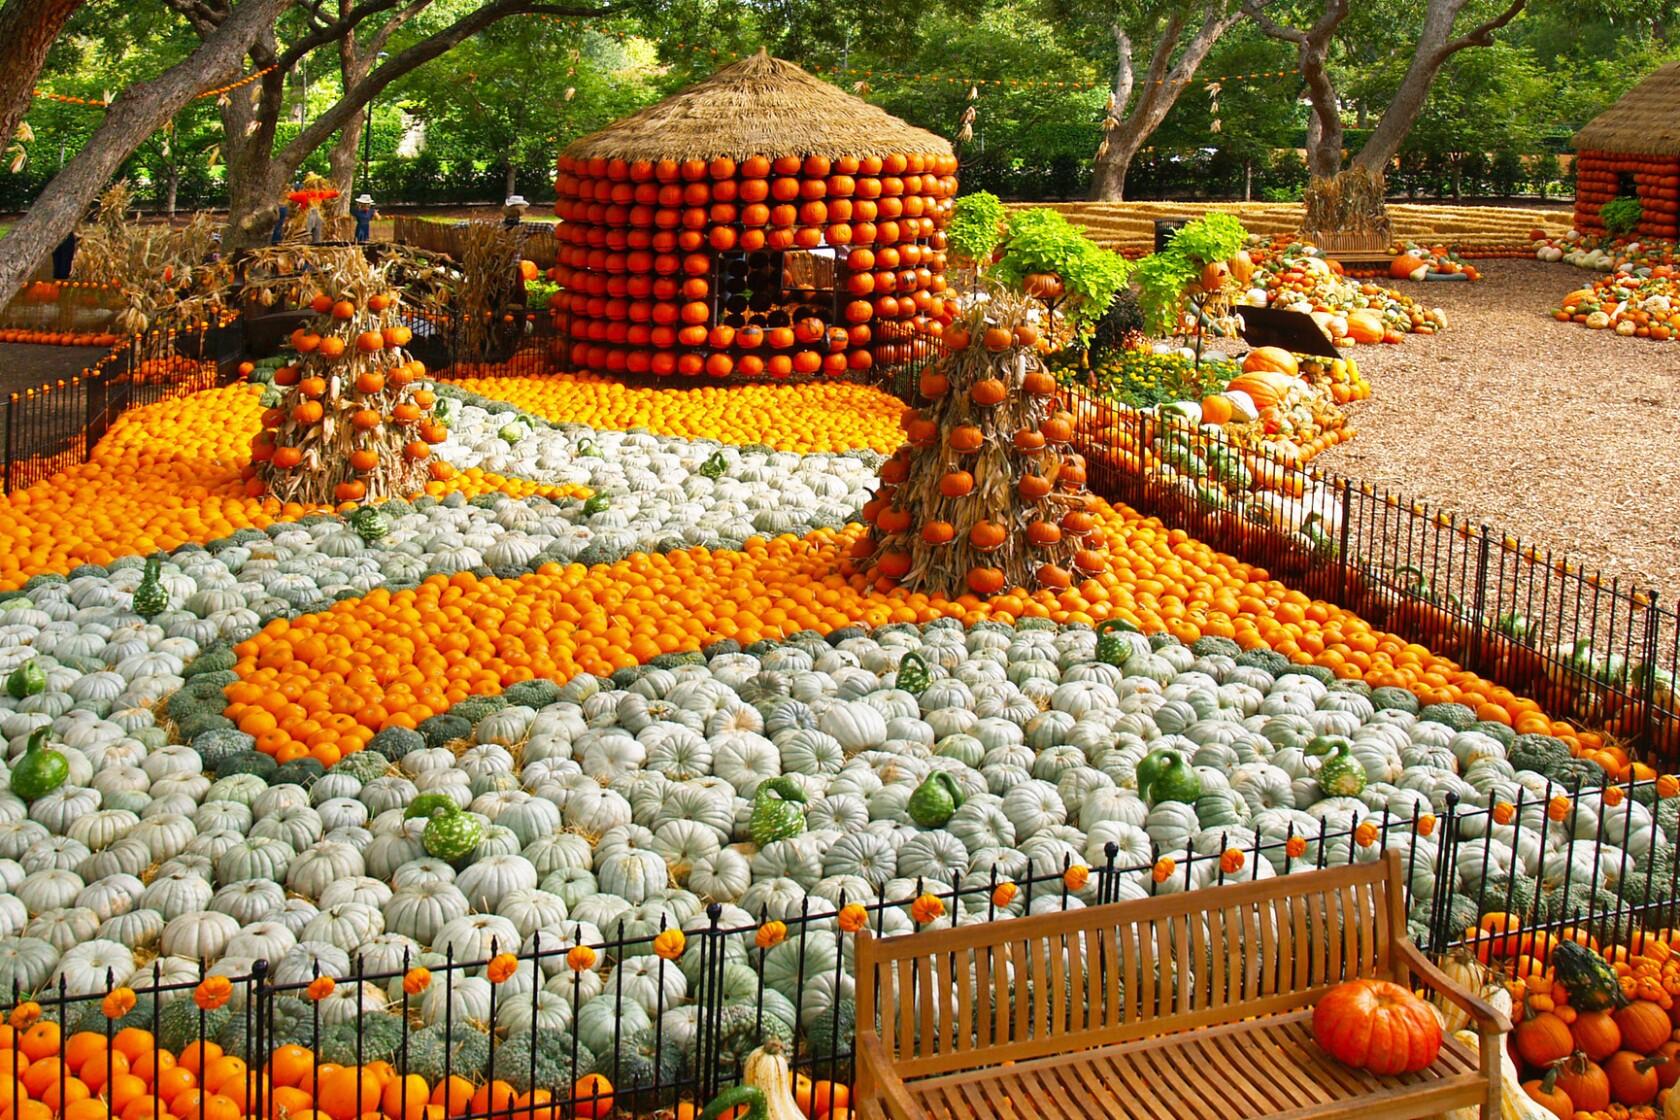 Dallas Arboretum Botanical Garden Shows Off A Plethora Of